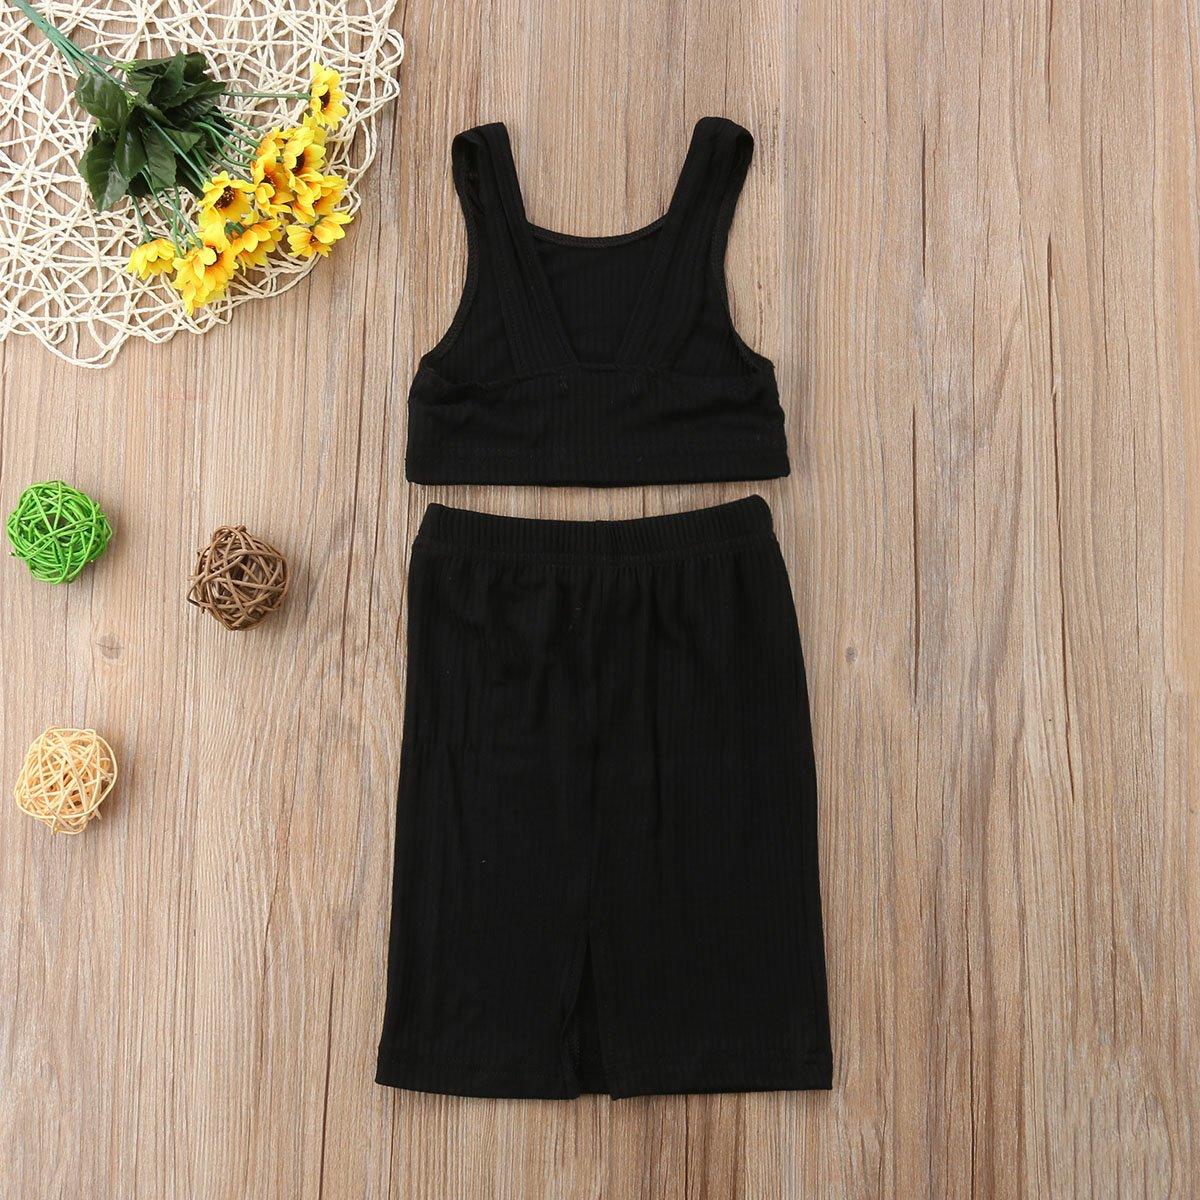 Toddler Little Baby Girl Summer Knitted Outfit,Tank Top+Tight Split Skirt Set